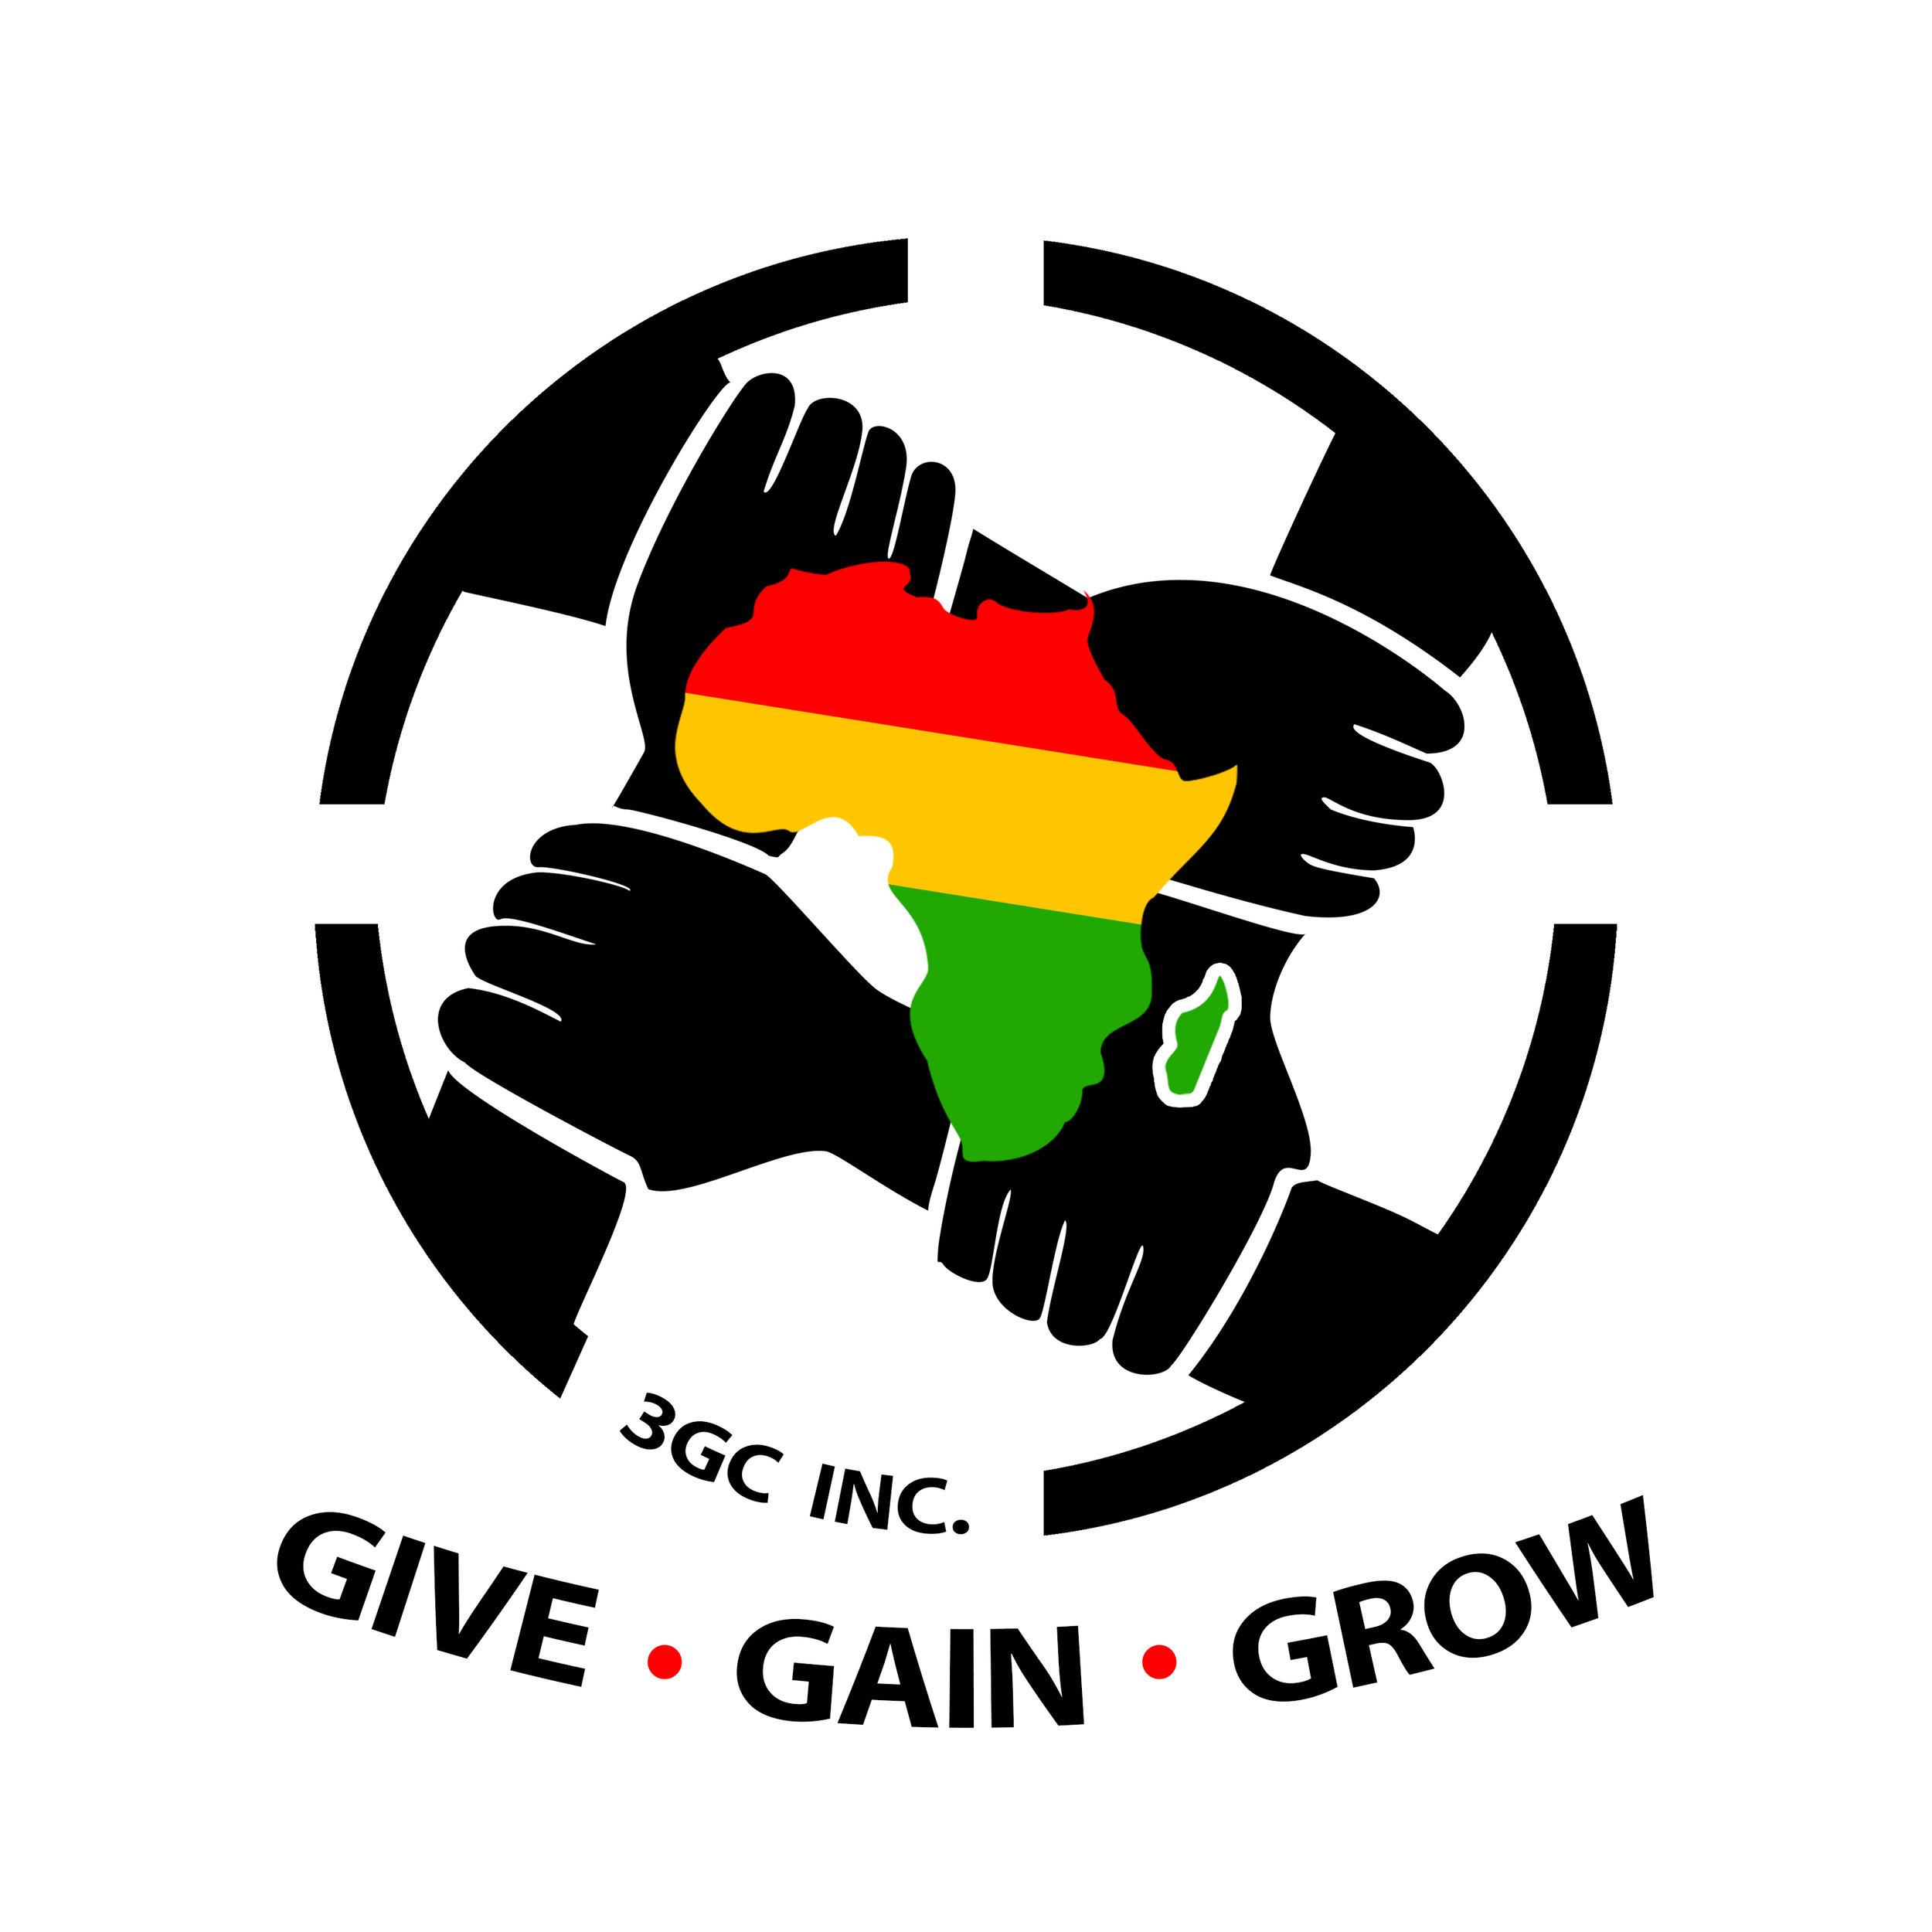 3GC logo 6 final.jpg